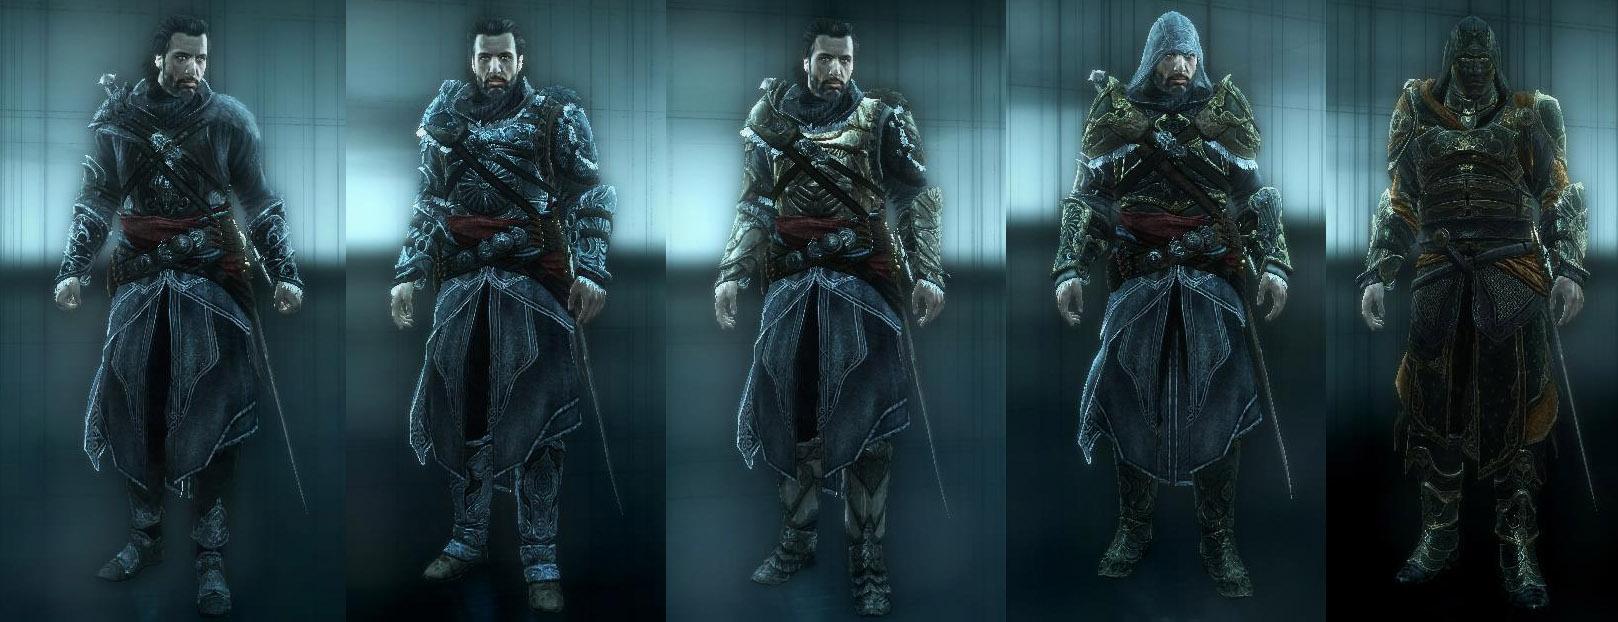 Арт к игре Assassin's Creed: Revelations